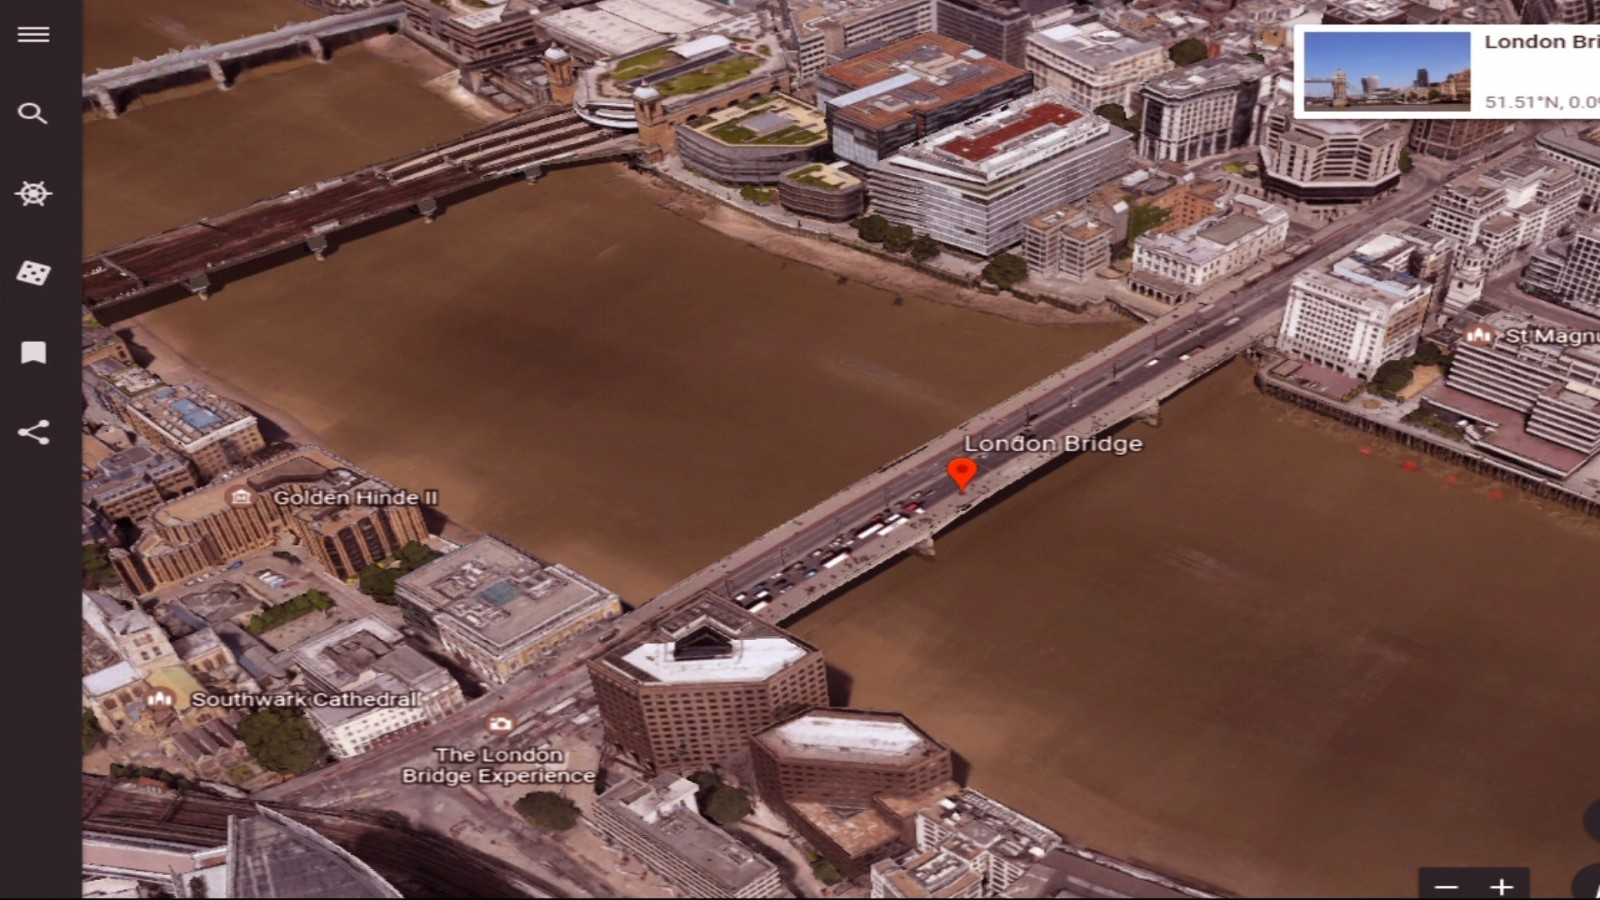 Report Incident At London Bridge CNN Video - Washington dc bridges map